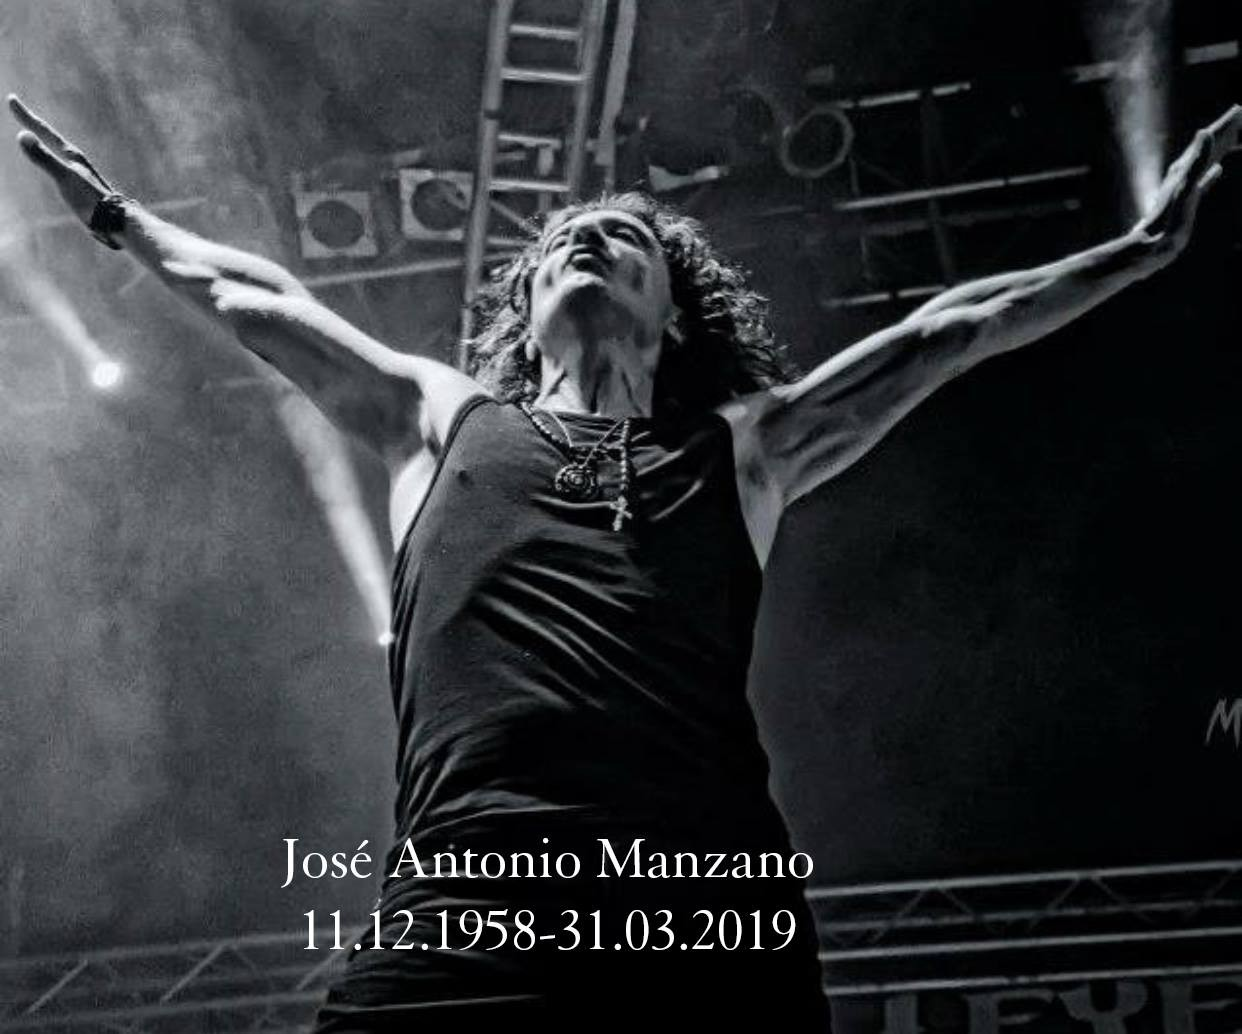 Jose Antonio Manzano